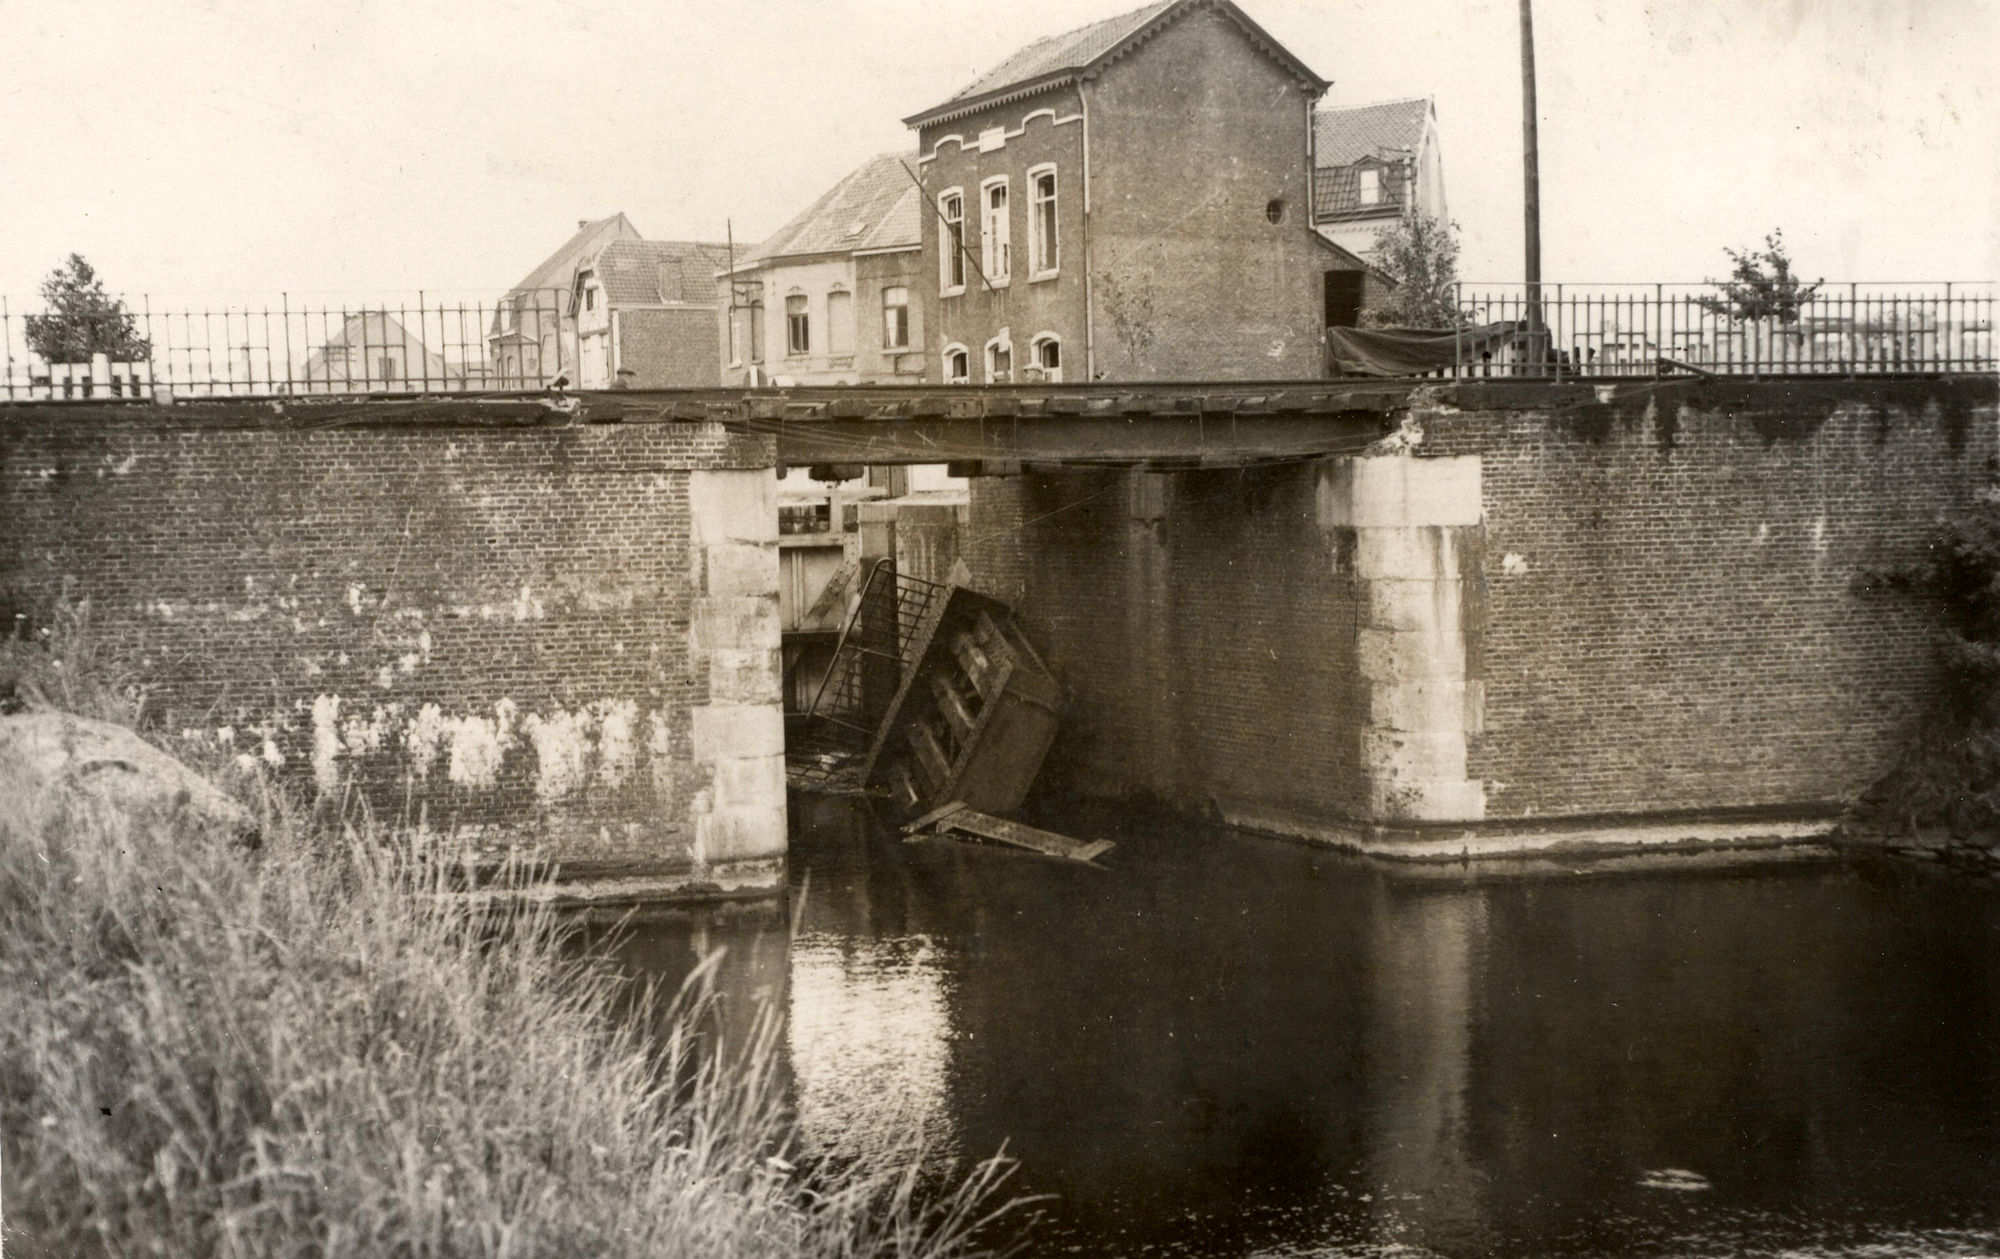 Spoorwegbrug aan het sluis Nr. 9 over het kanaal Bossuit-Kortrijk aan de Visserskaai 1940